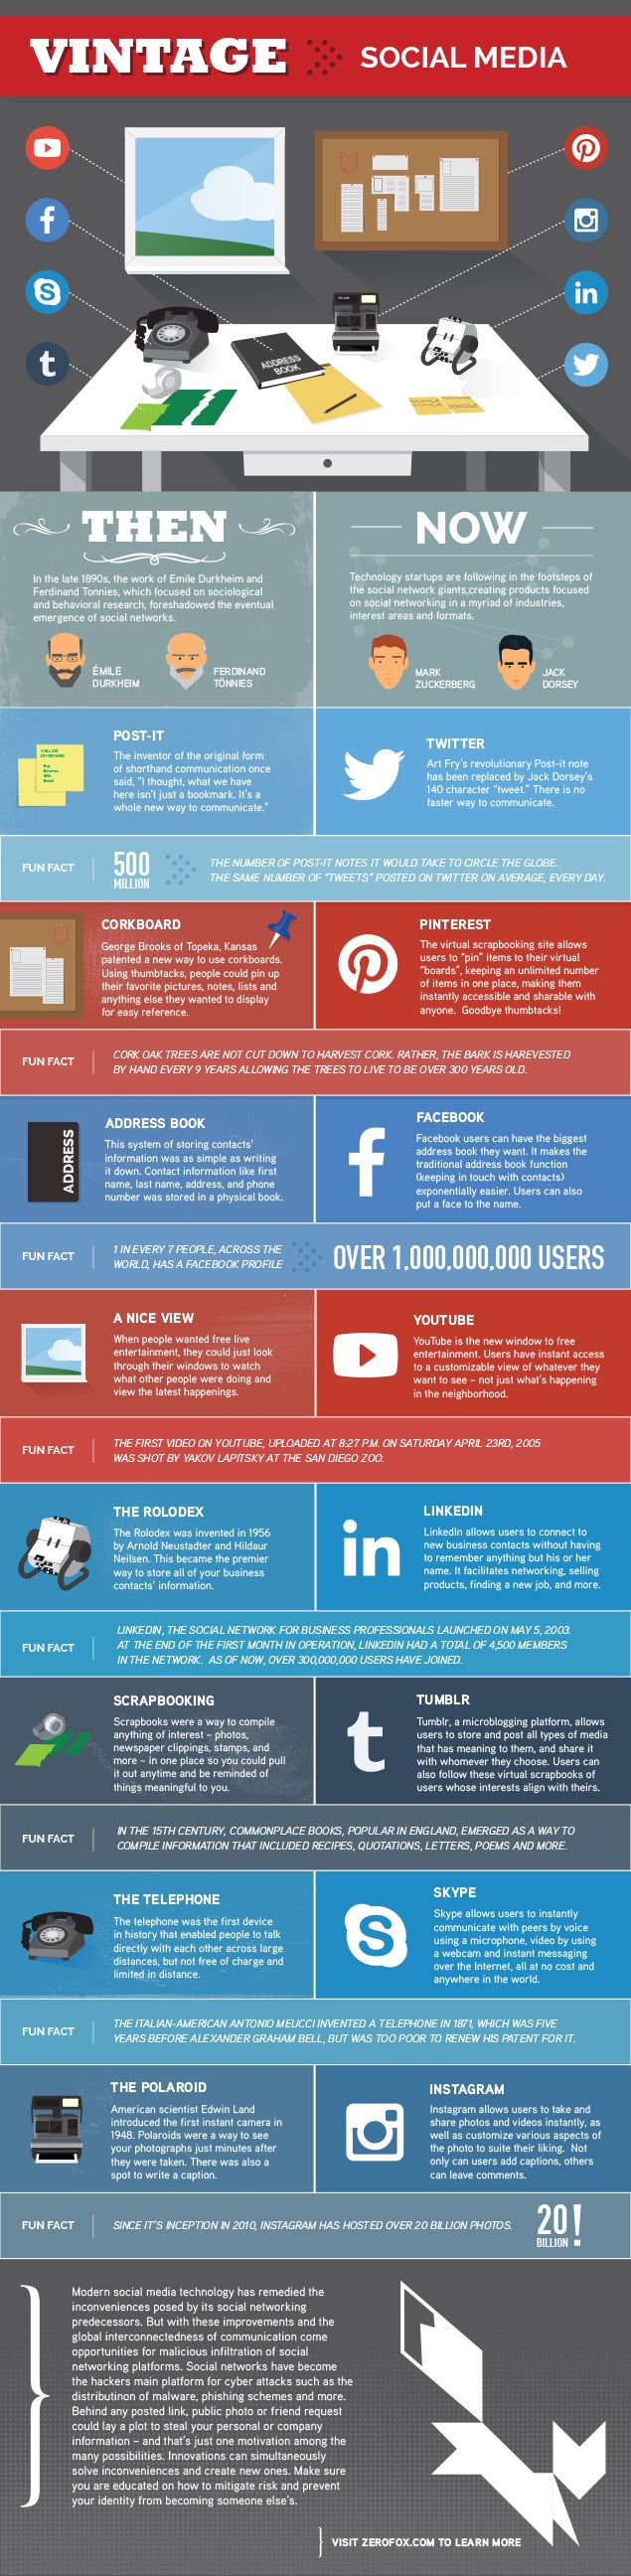 Redes Sociales Vintage #infografia #infographic #socialmedia